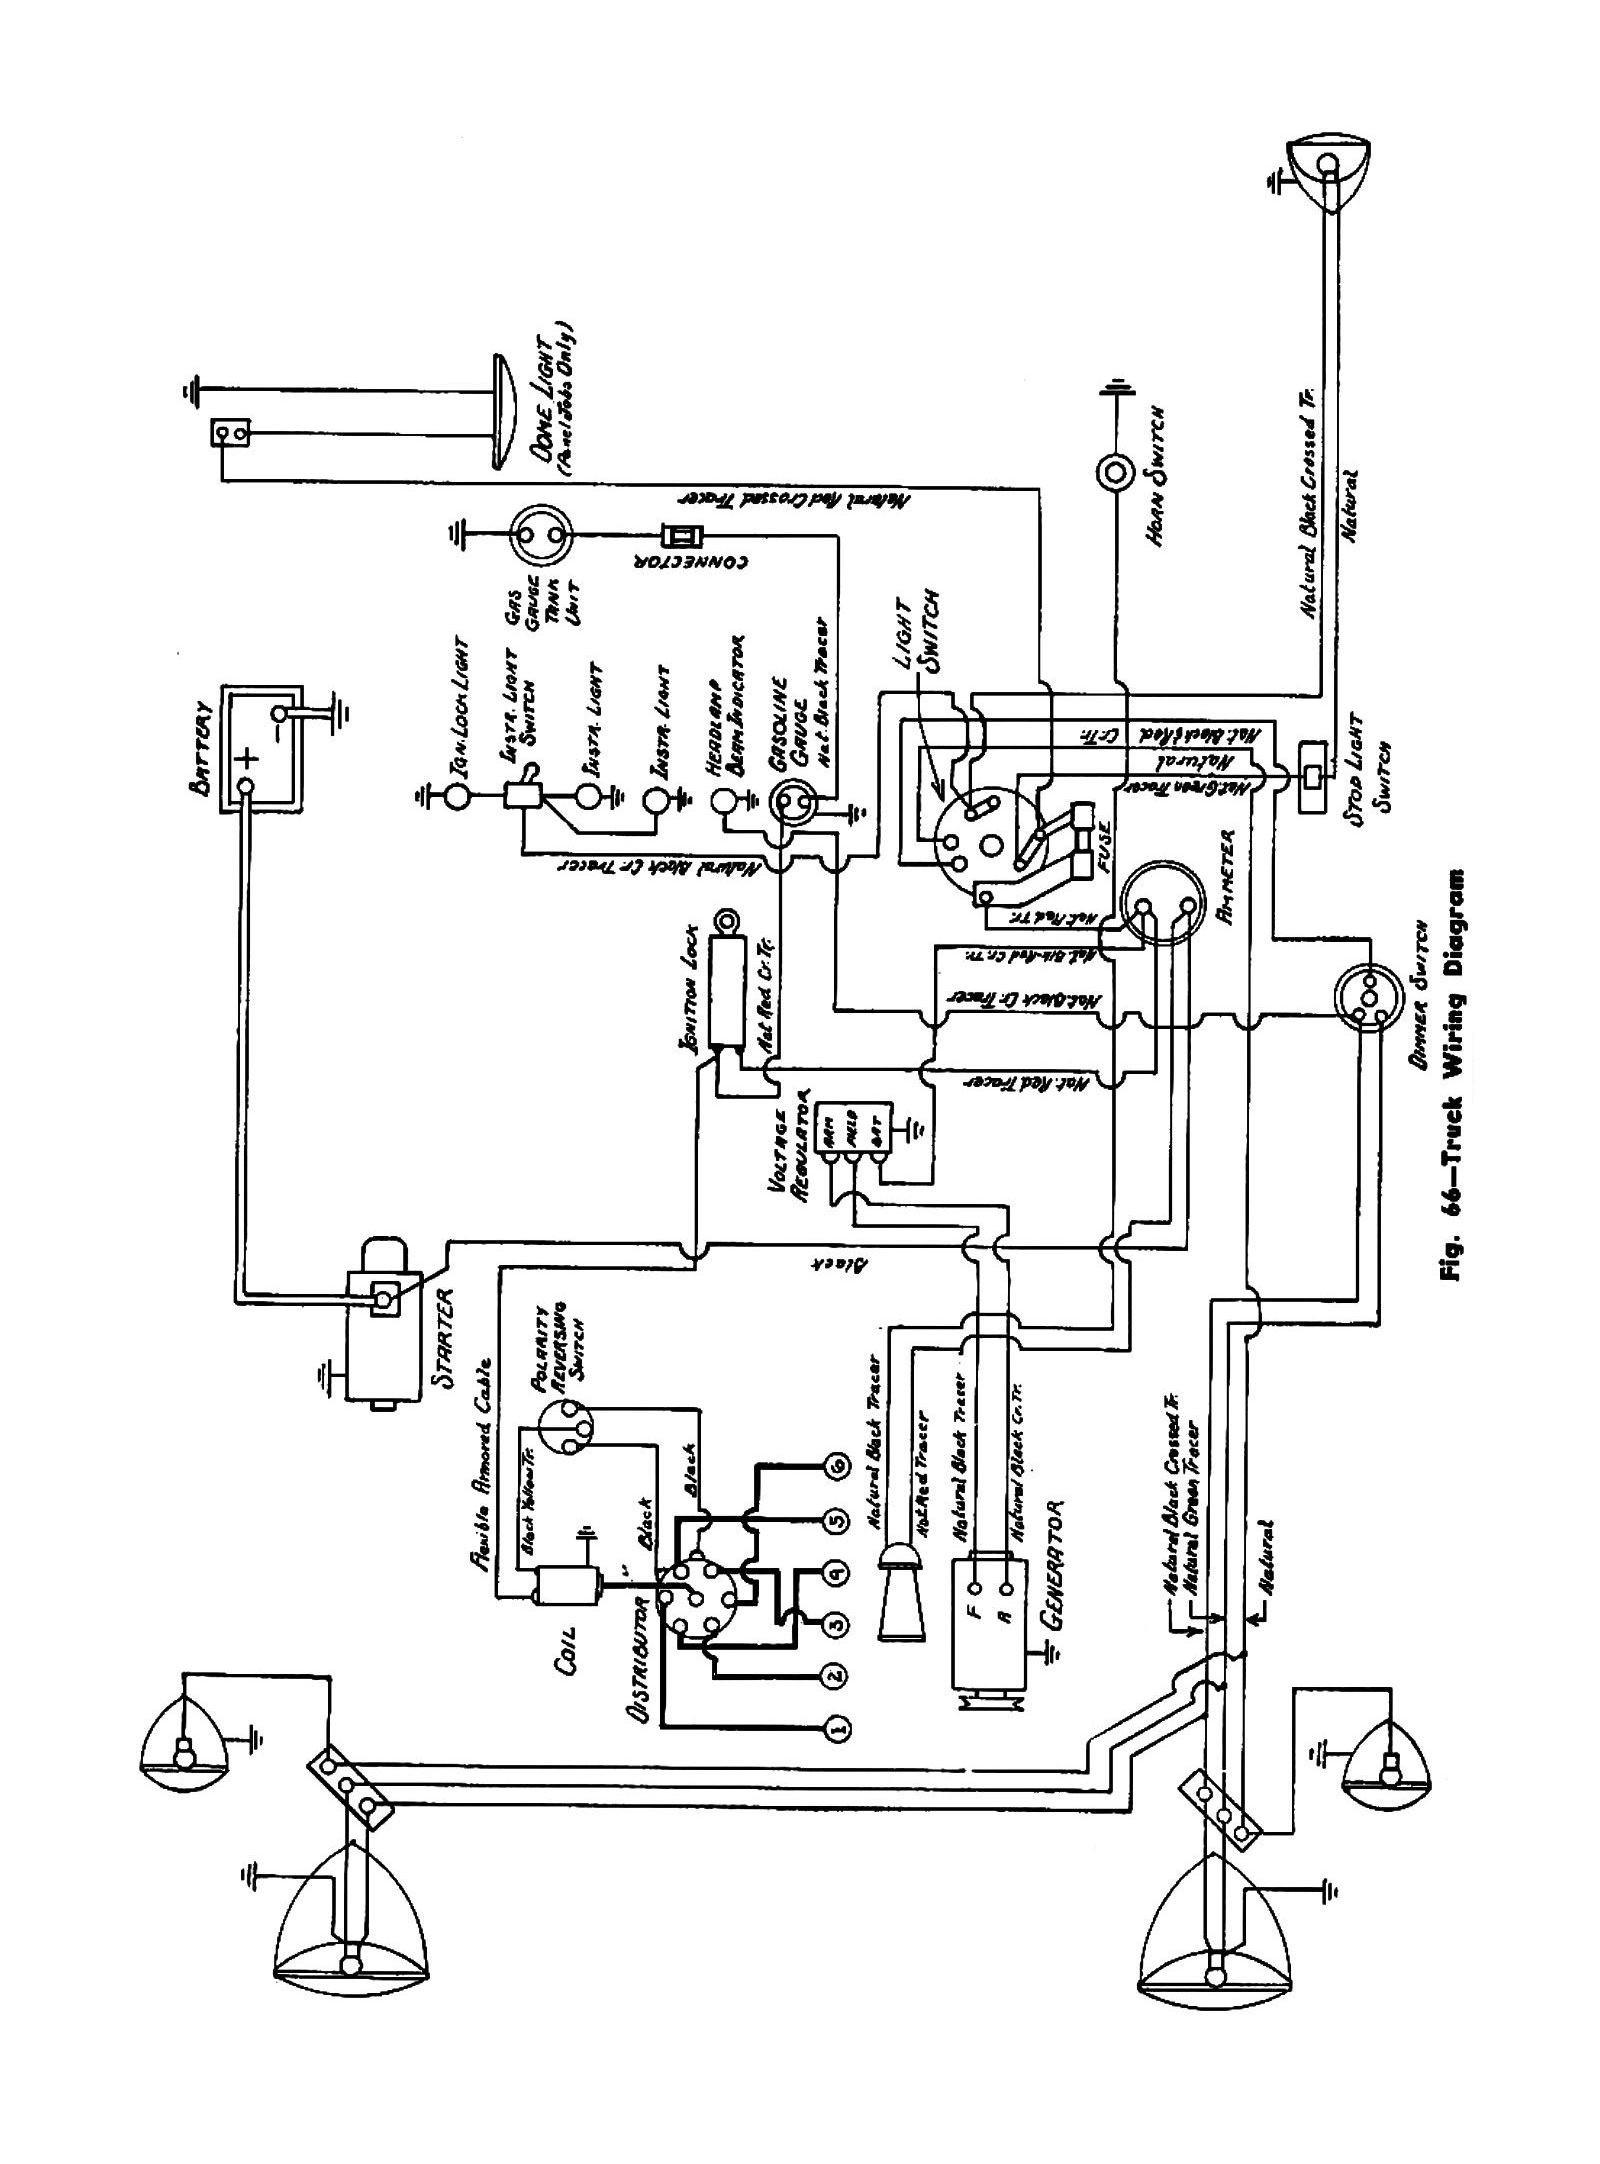 1955 Chevy Fuel Gauge Wiring 57 Chevy Gas Gauge Problem ... on